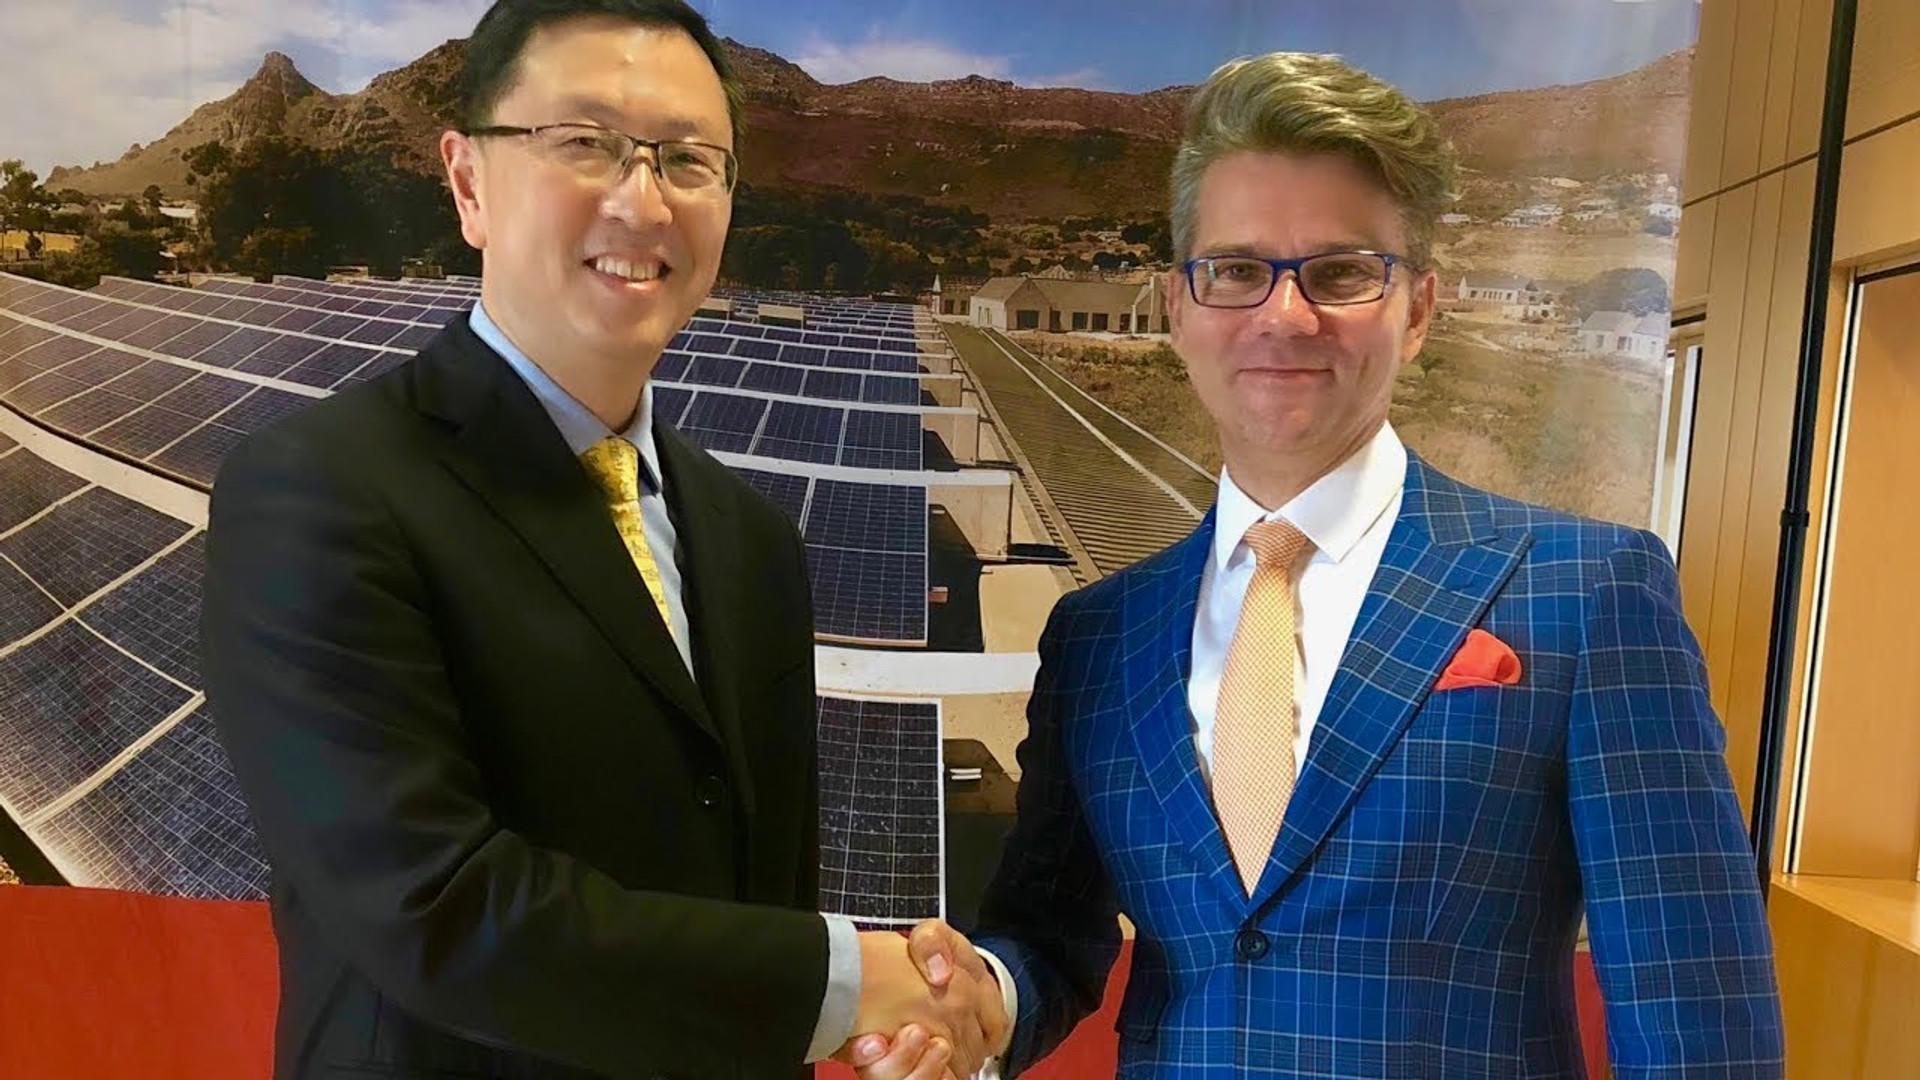 Shawn Qu, Canadian Solar's CEO on Mono vs Crystalline Technologies, Solar Lifestyle & more